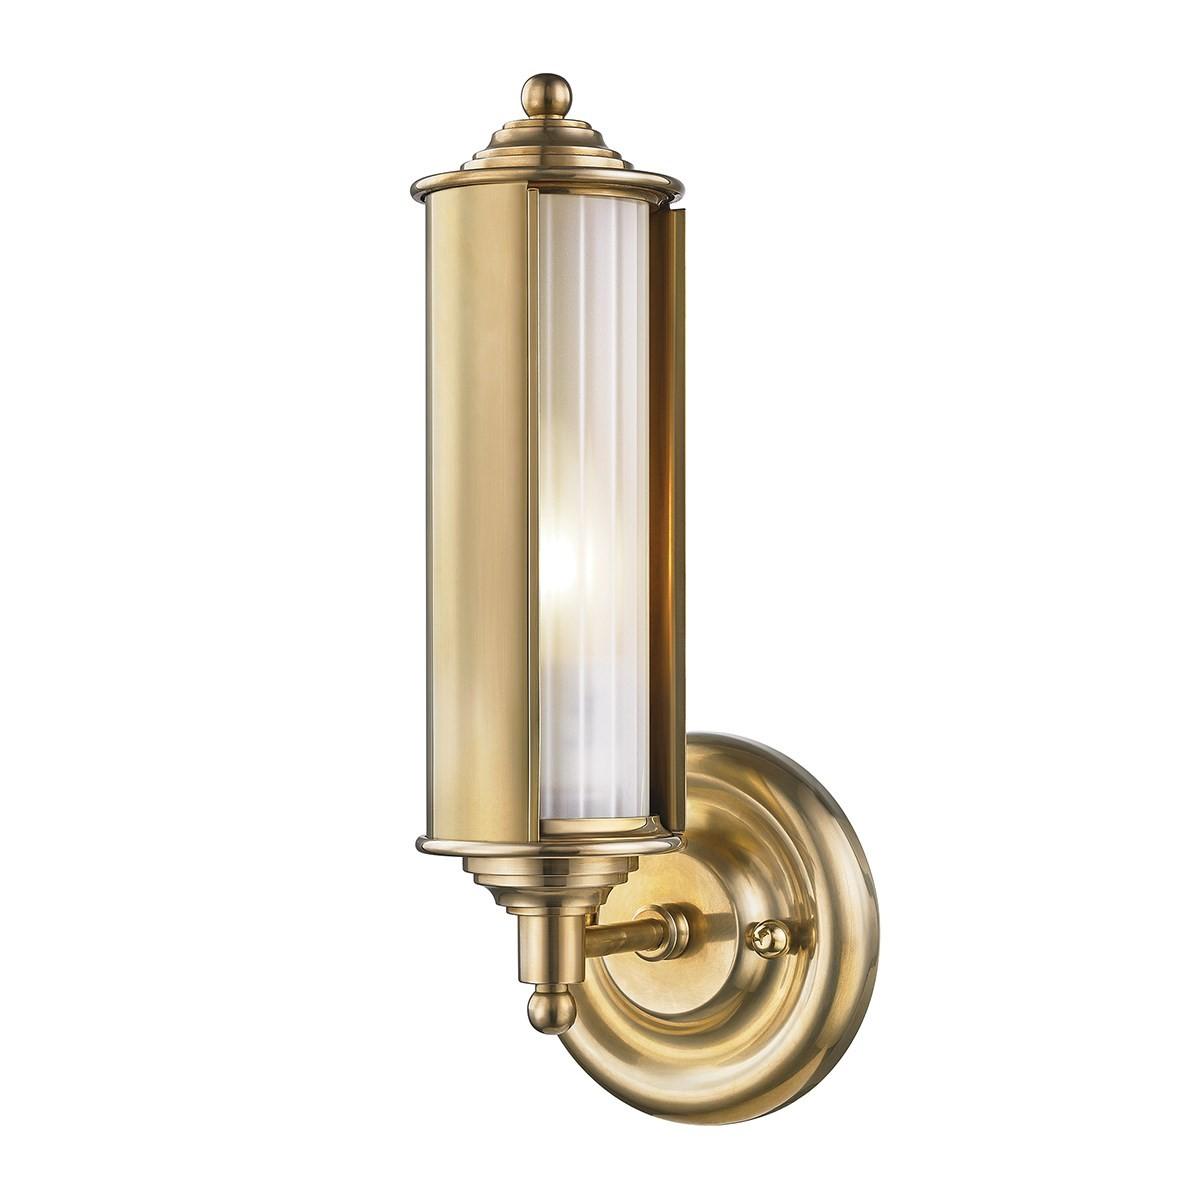 Hudson Valley I Classic No 1 Wall light I Aged Brass